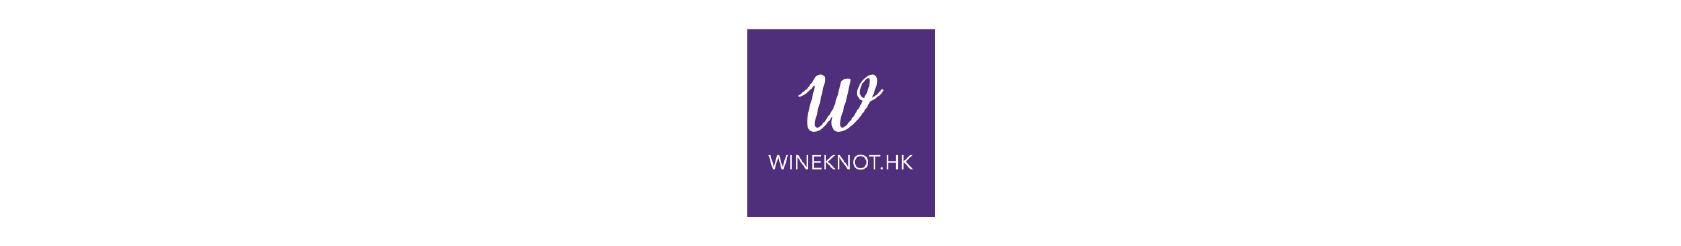 logo_1127-05